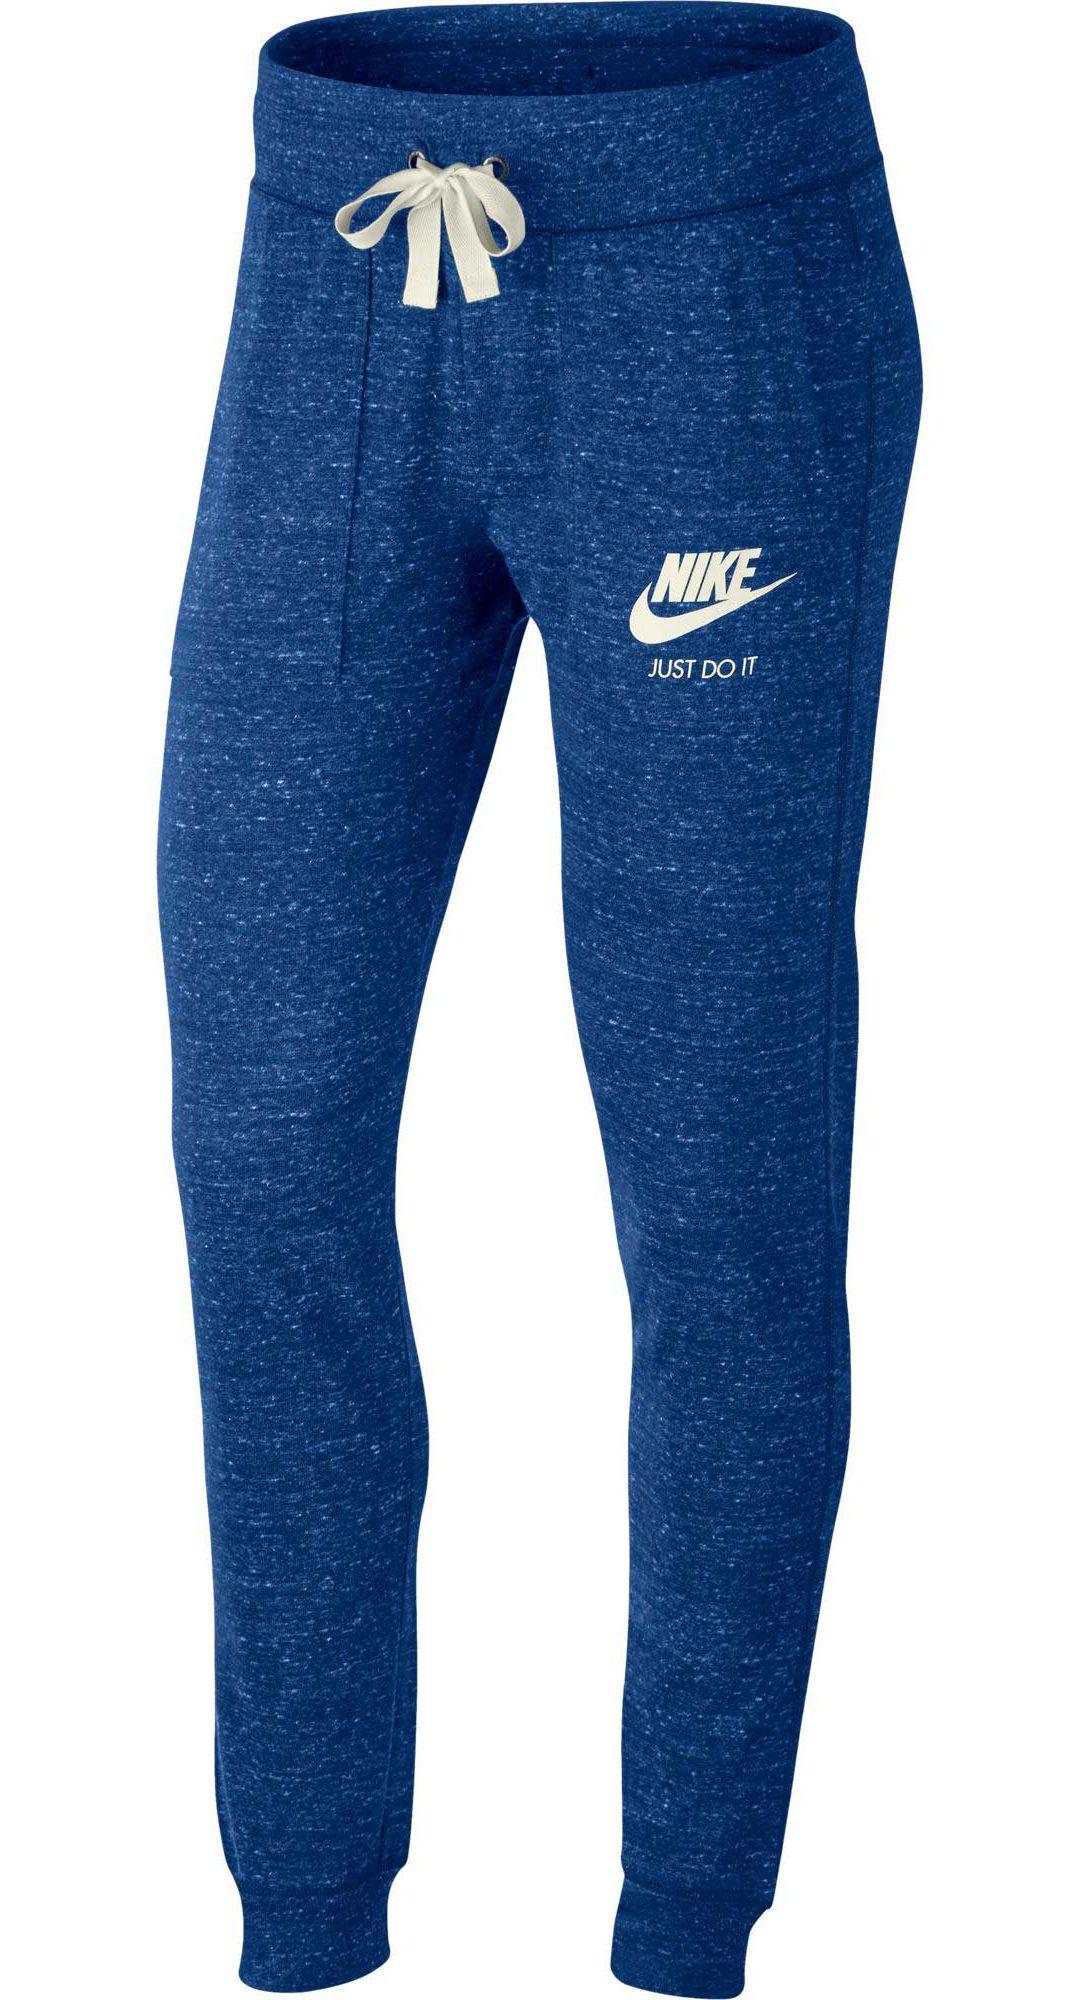 2ffdf71a74982 Nike Women's Sportswear Gym Vintage Pants | DICK'S Sporting Goods